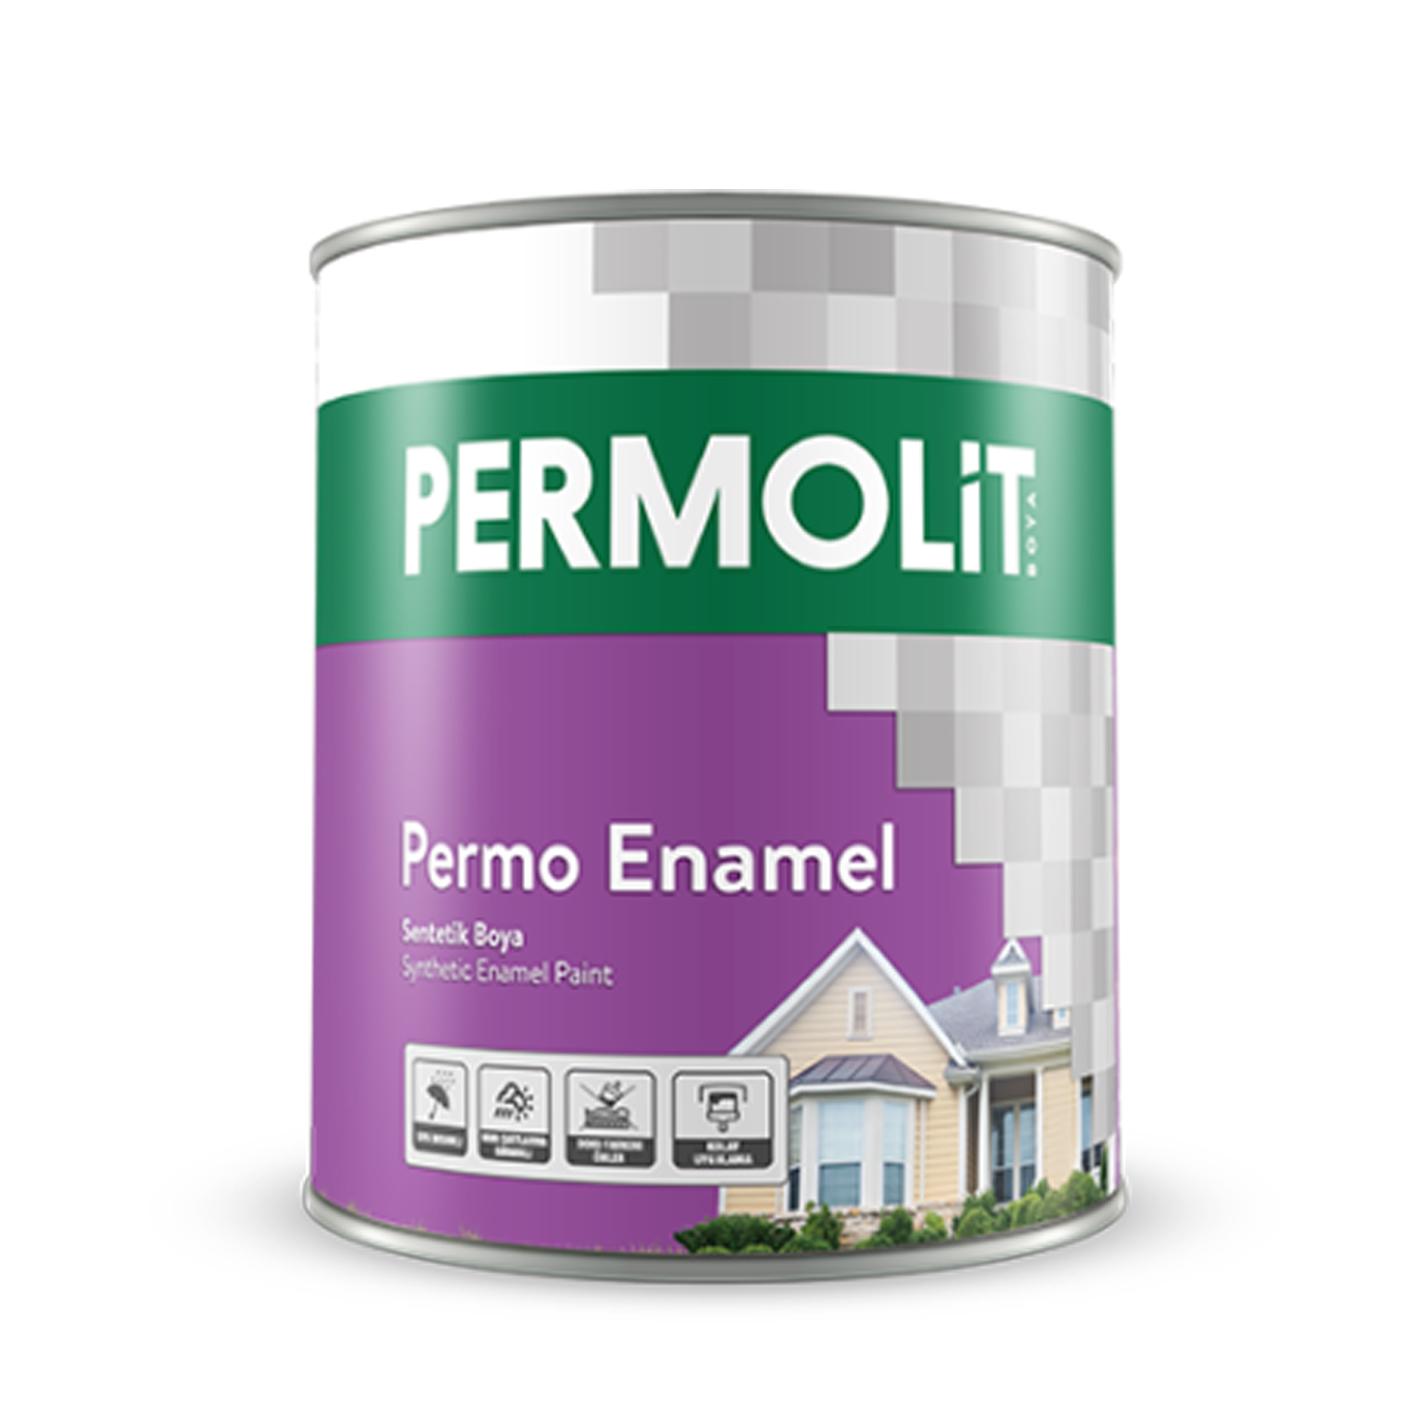 Permolit Permo Enamel Sentetik Nefti Yeşil 2.5Lt